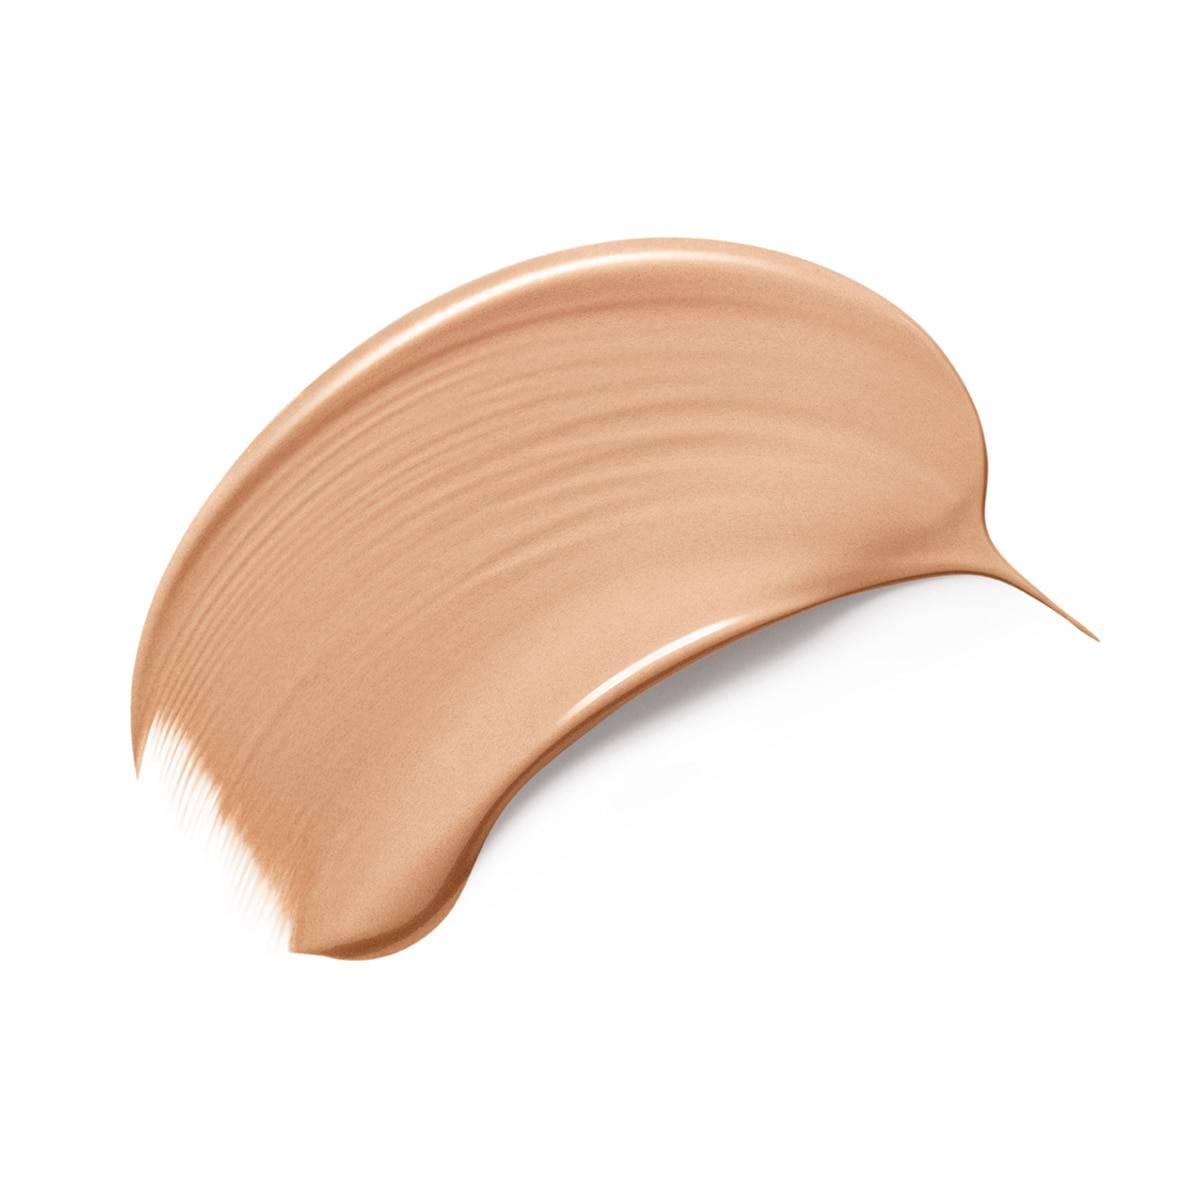 La Roche Posay ProduktSide Rosaliac CC Creme Tekstur